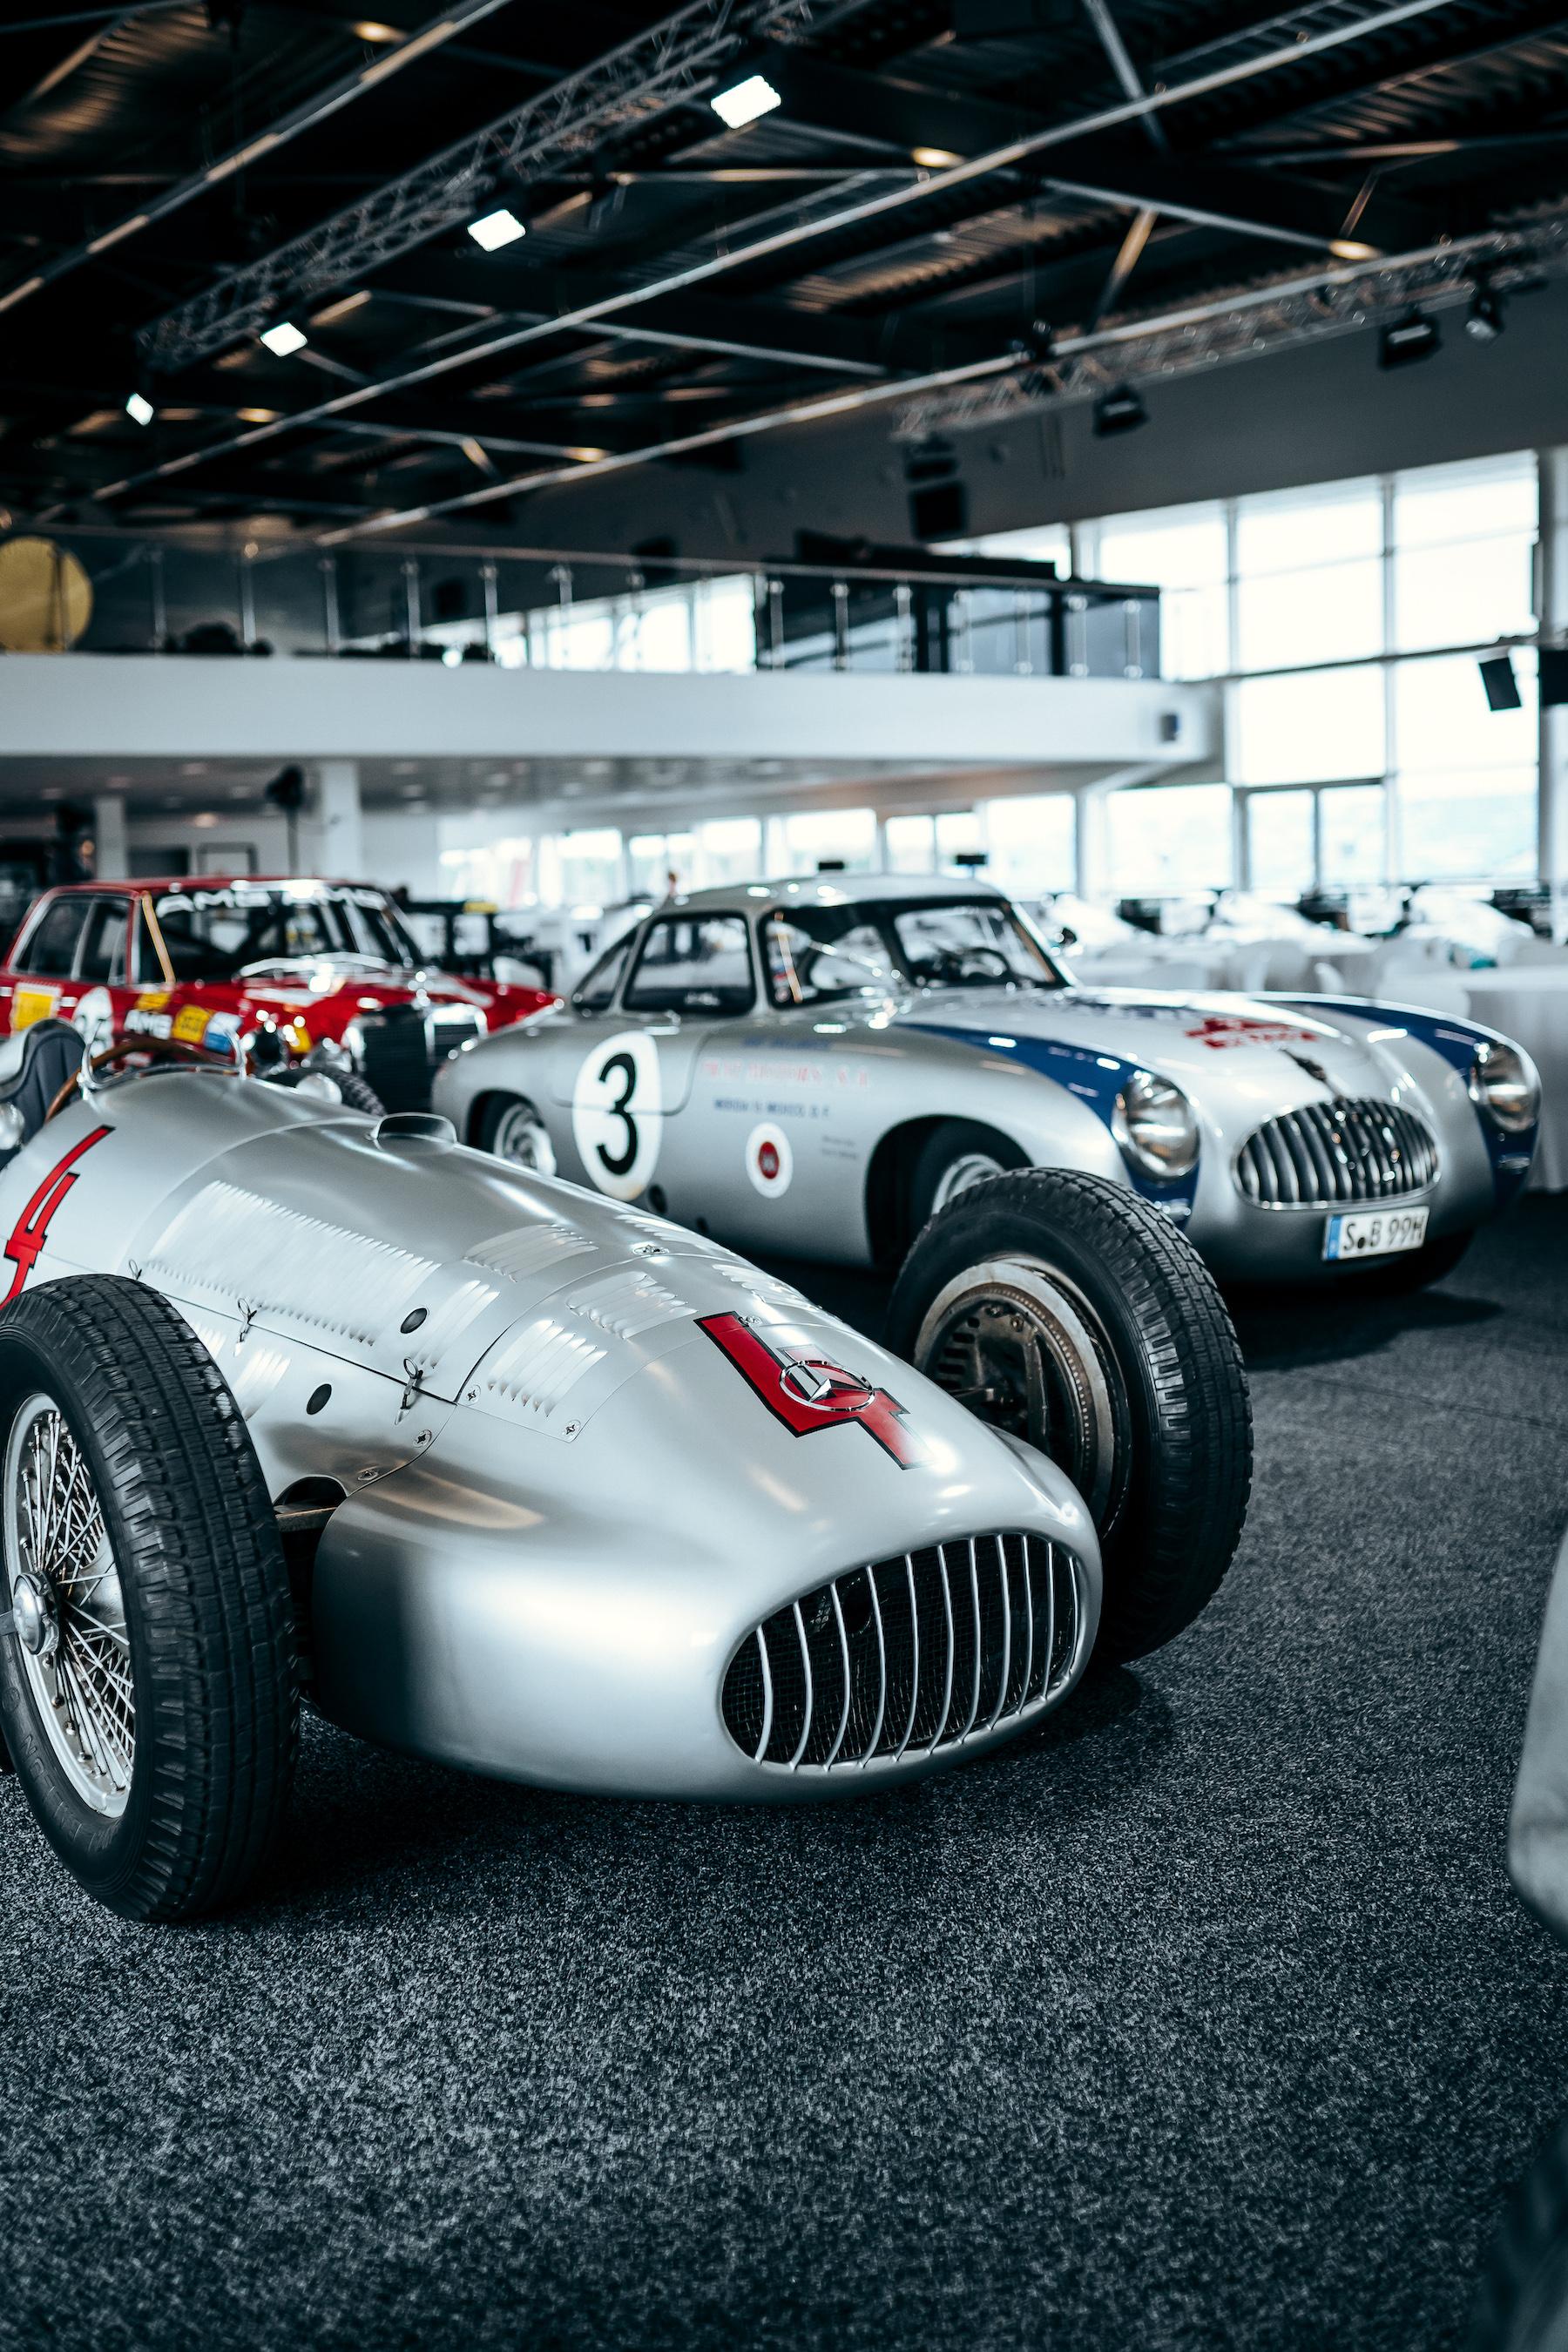 2019 Mercedes 125 years in Motorsports celebration | 2019 Silverstone 1.jpg